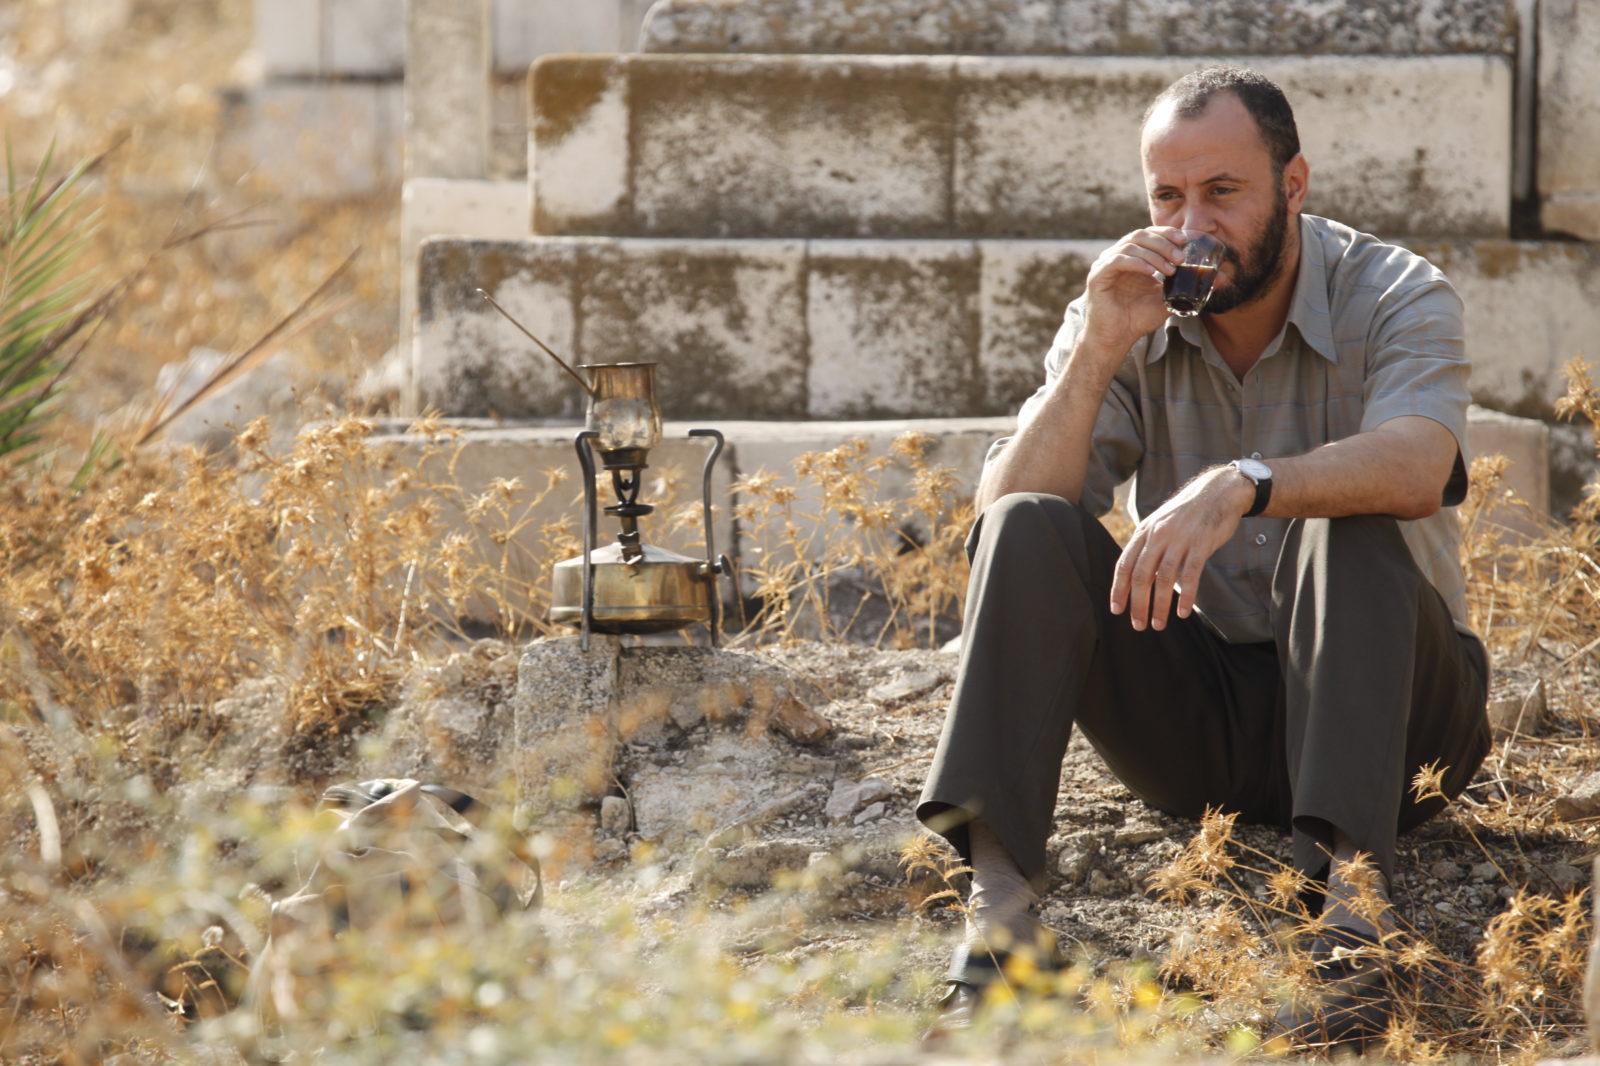 THE LAST FRIDAY (Jordanie) - 2012